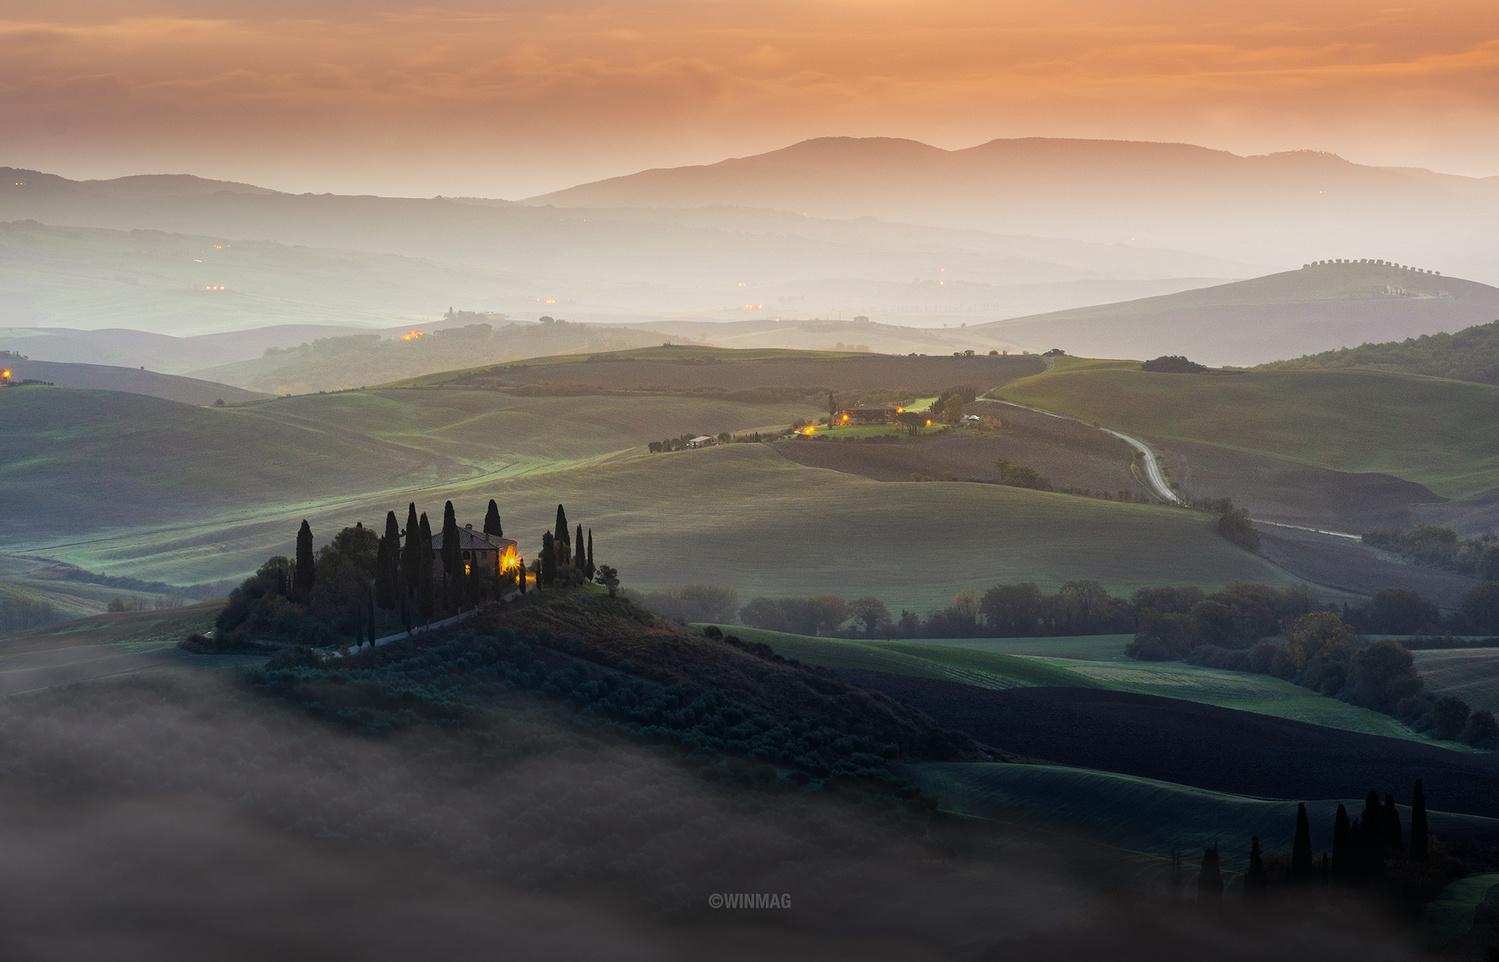 Tuscan Dreams by Win Mag